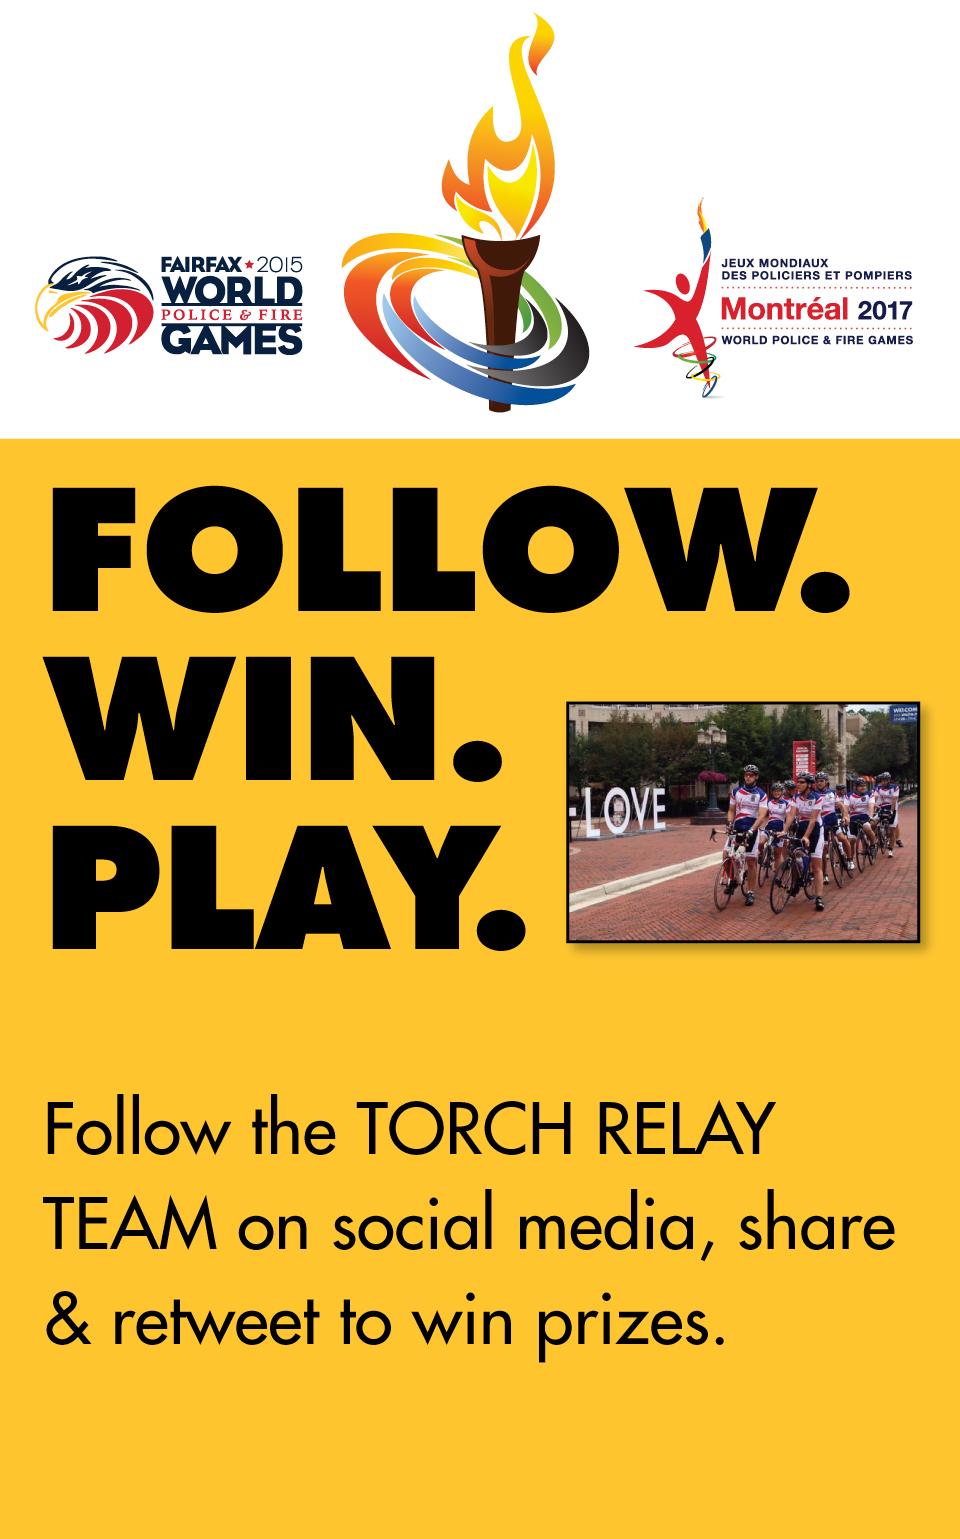 wpfg_montreal_day1_facebook_follow